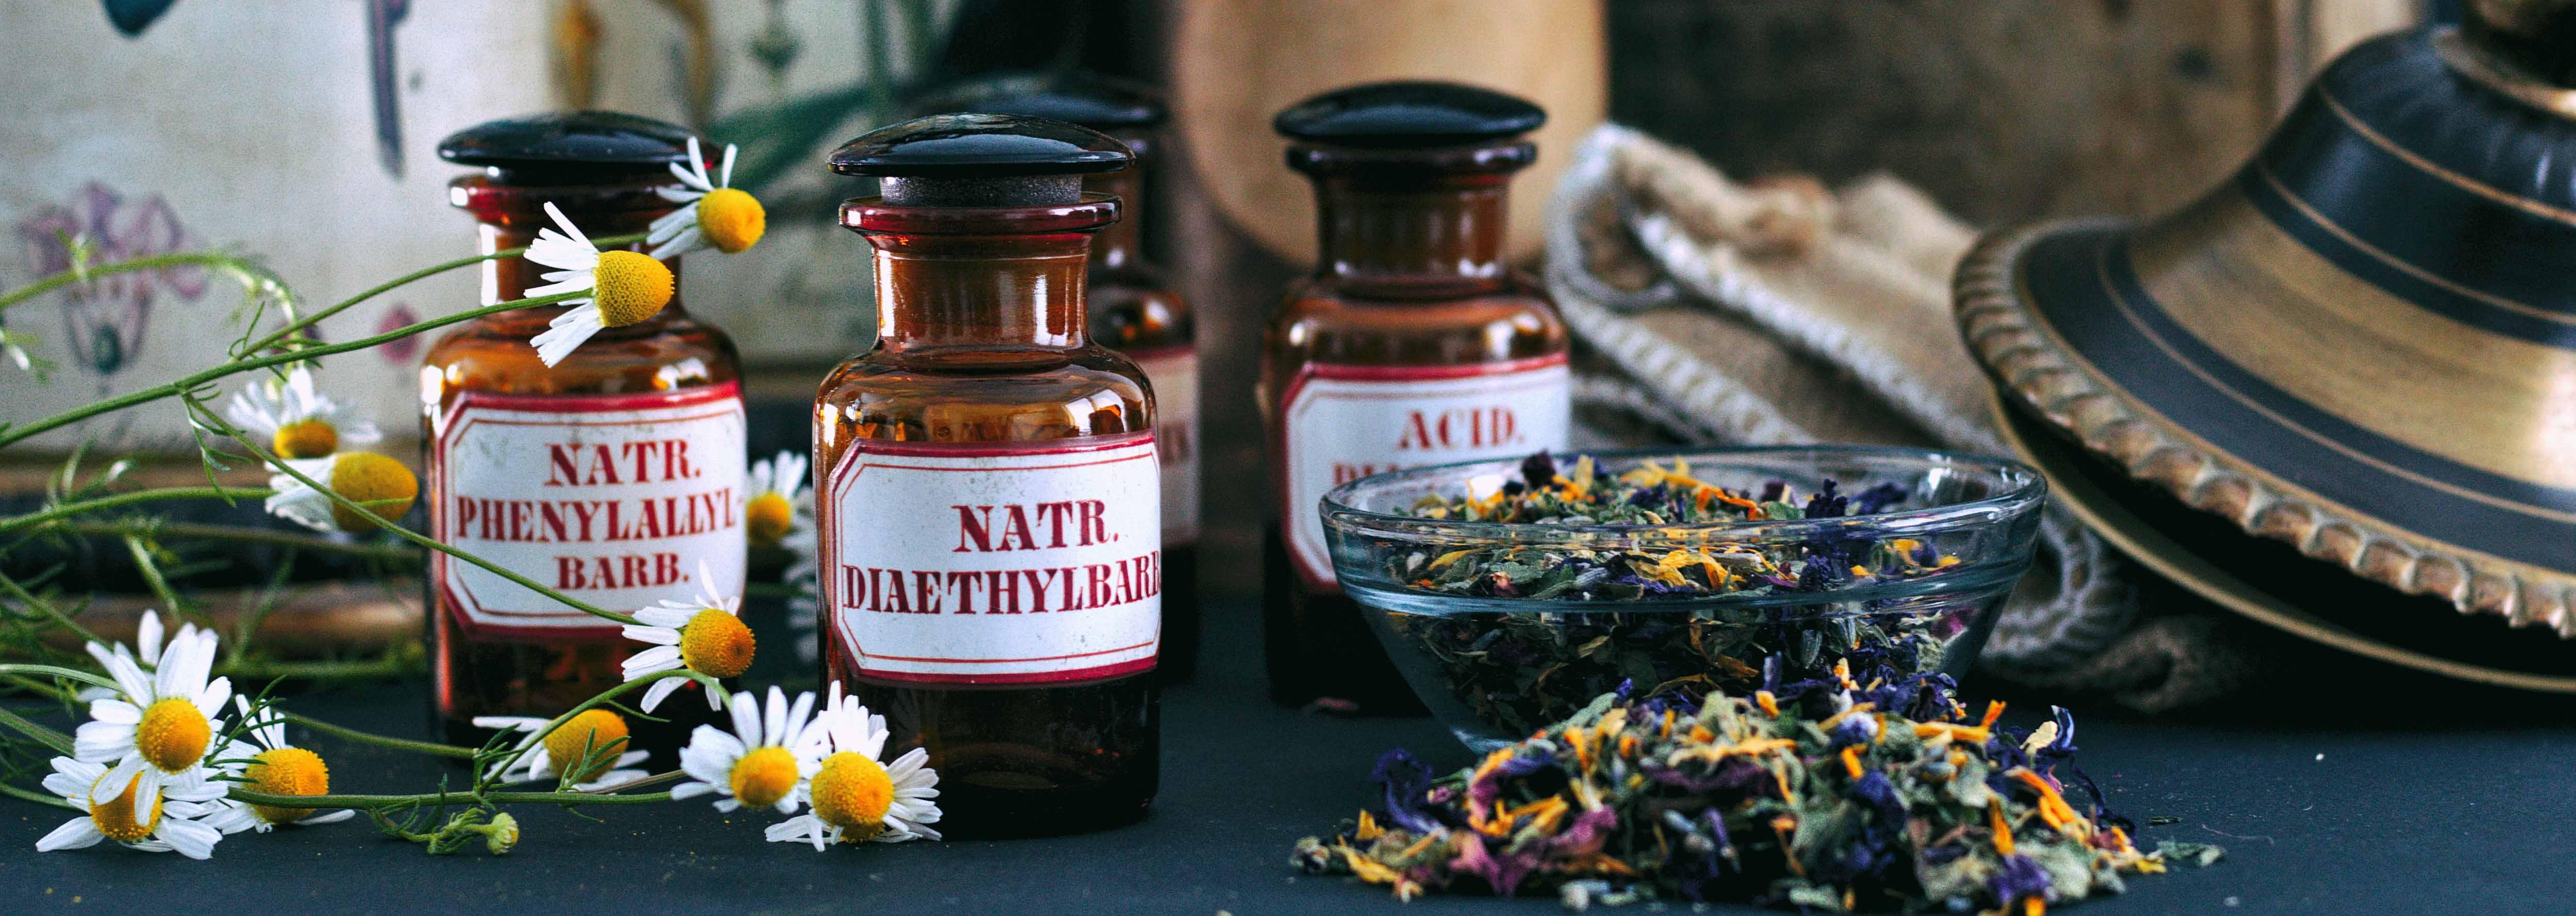 Natur, Naturheilkunde, Bachblüten,